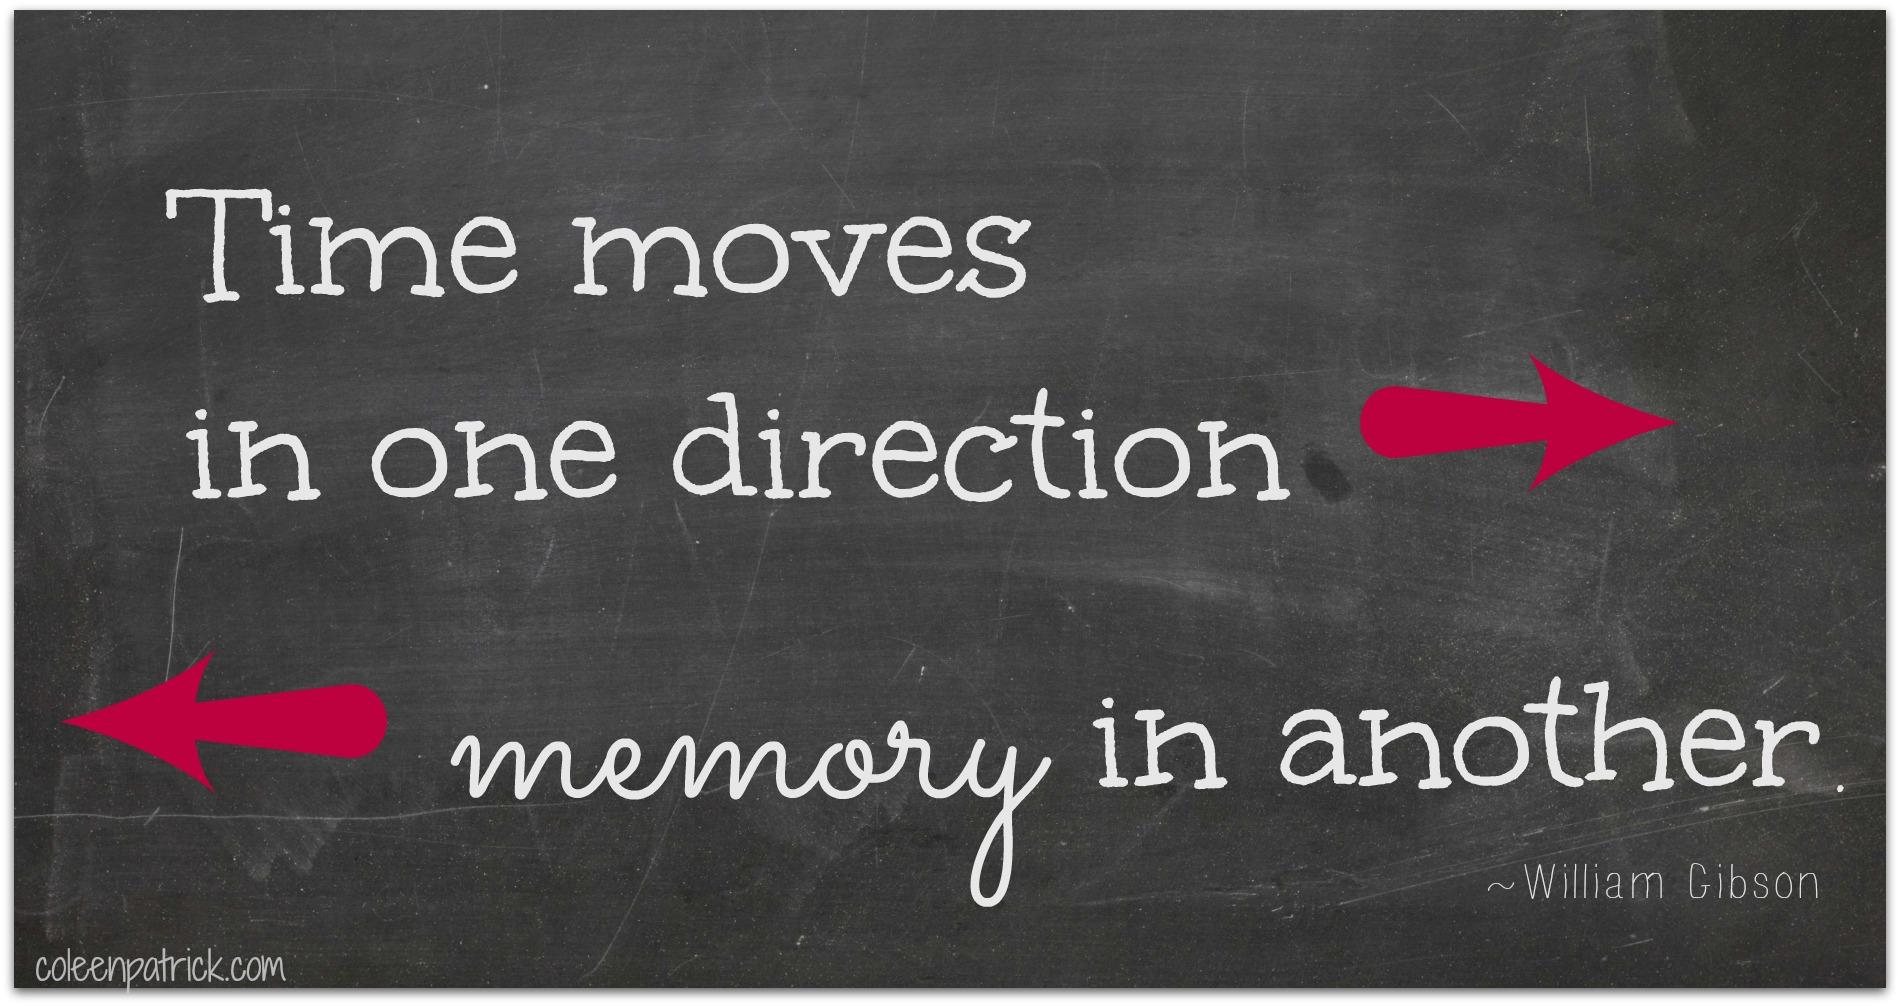 Quotes About Better Days Quotesgram: School Days Memories Quotes. QuotesGram